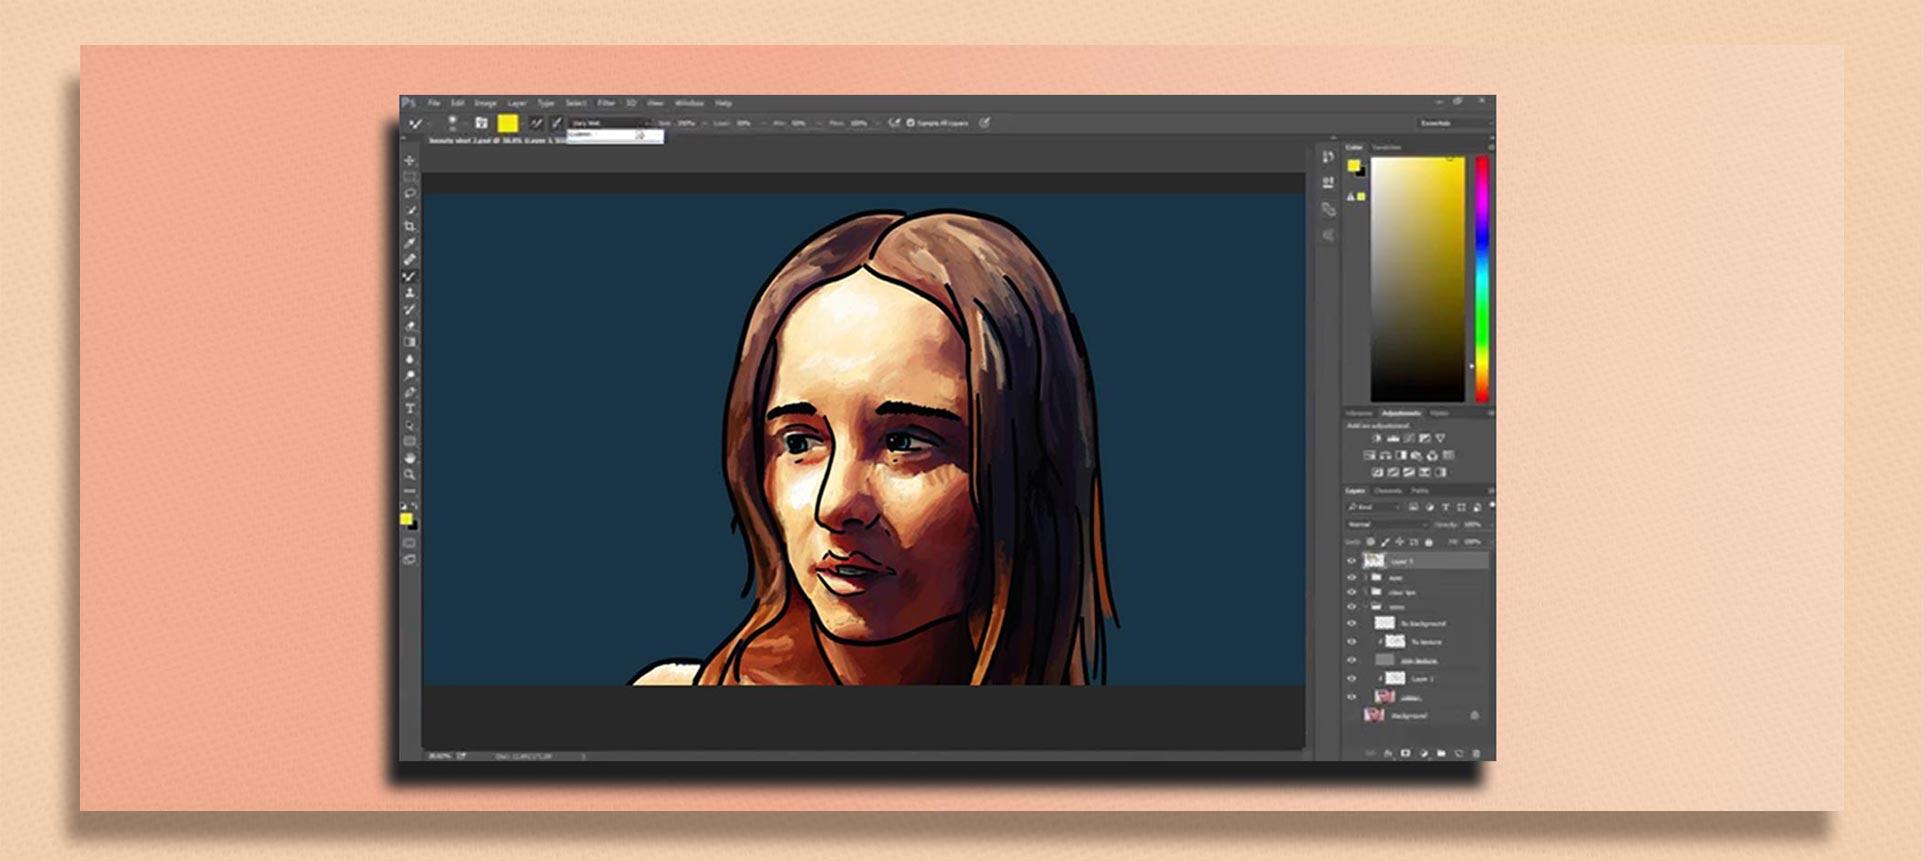 brush tool  photoshop3 1 - چگونه از ابزار براش در فتوشاپ استفاده کنیم